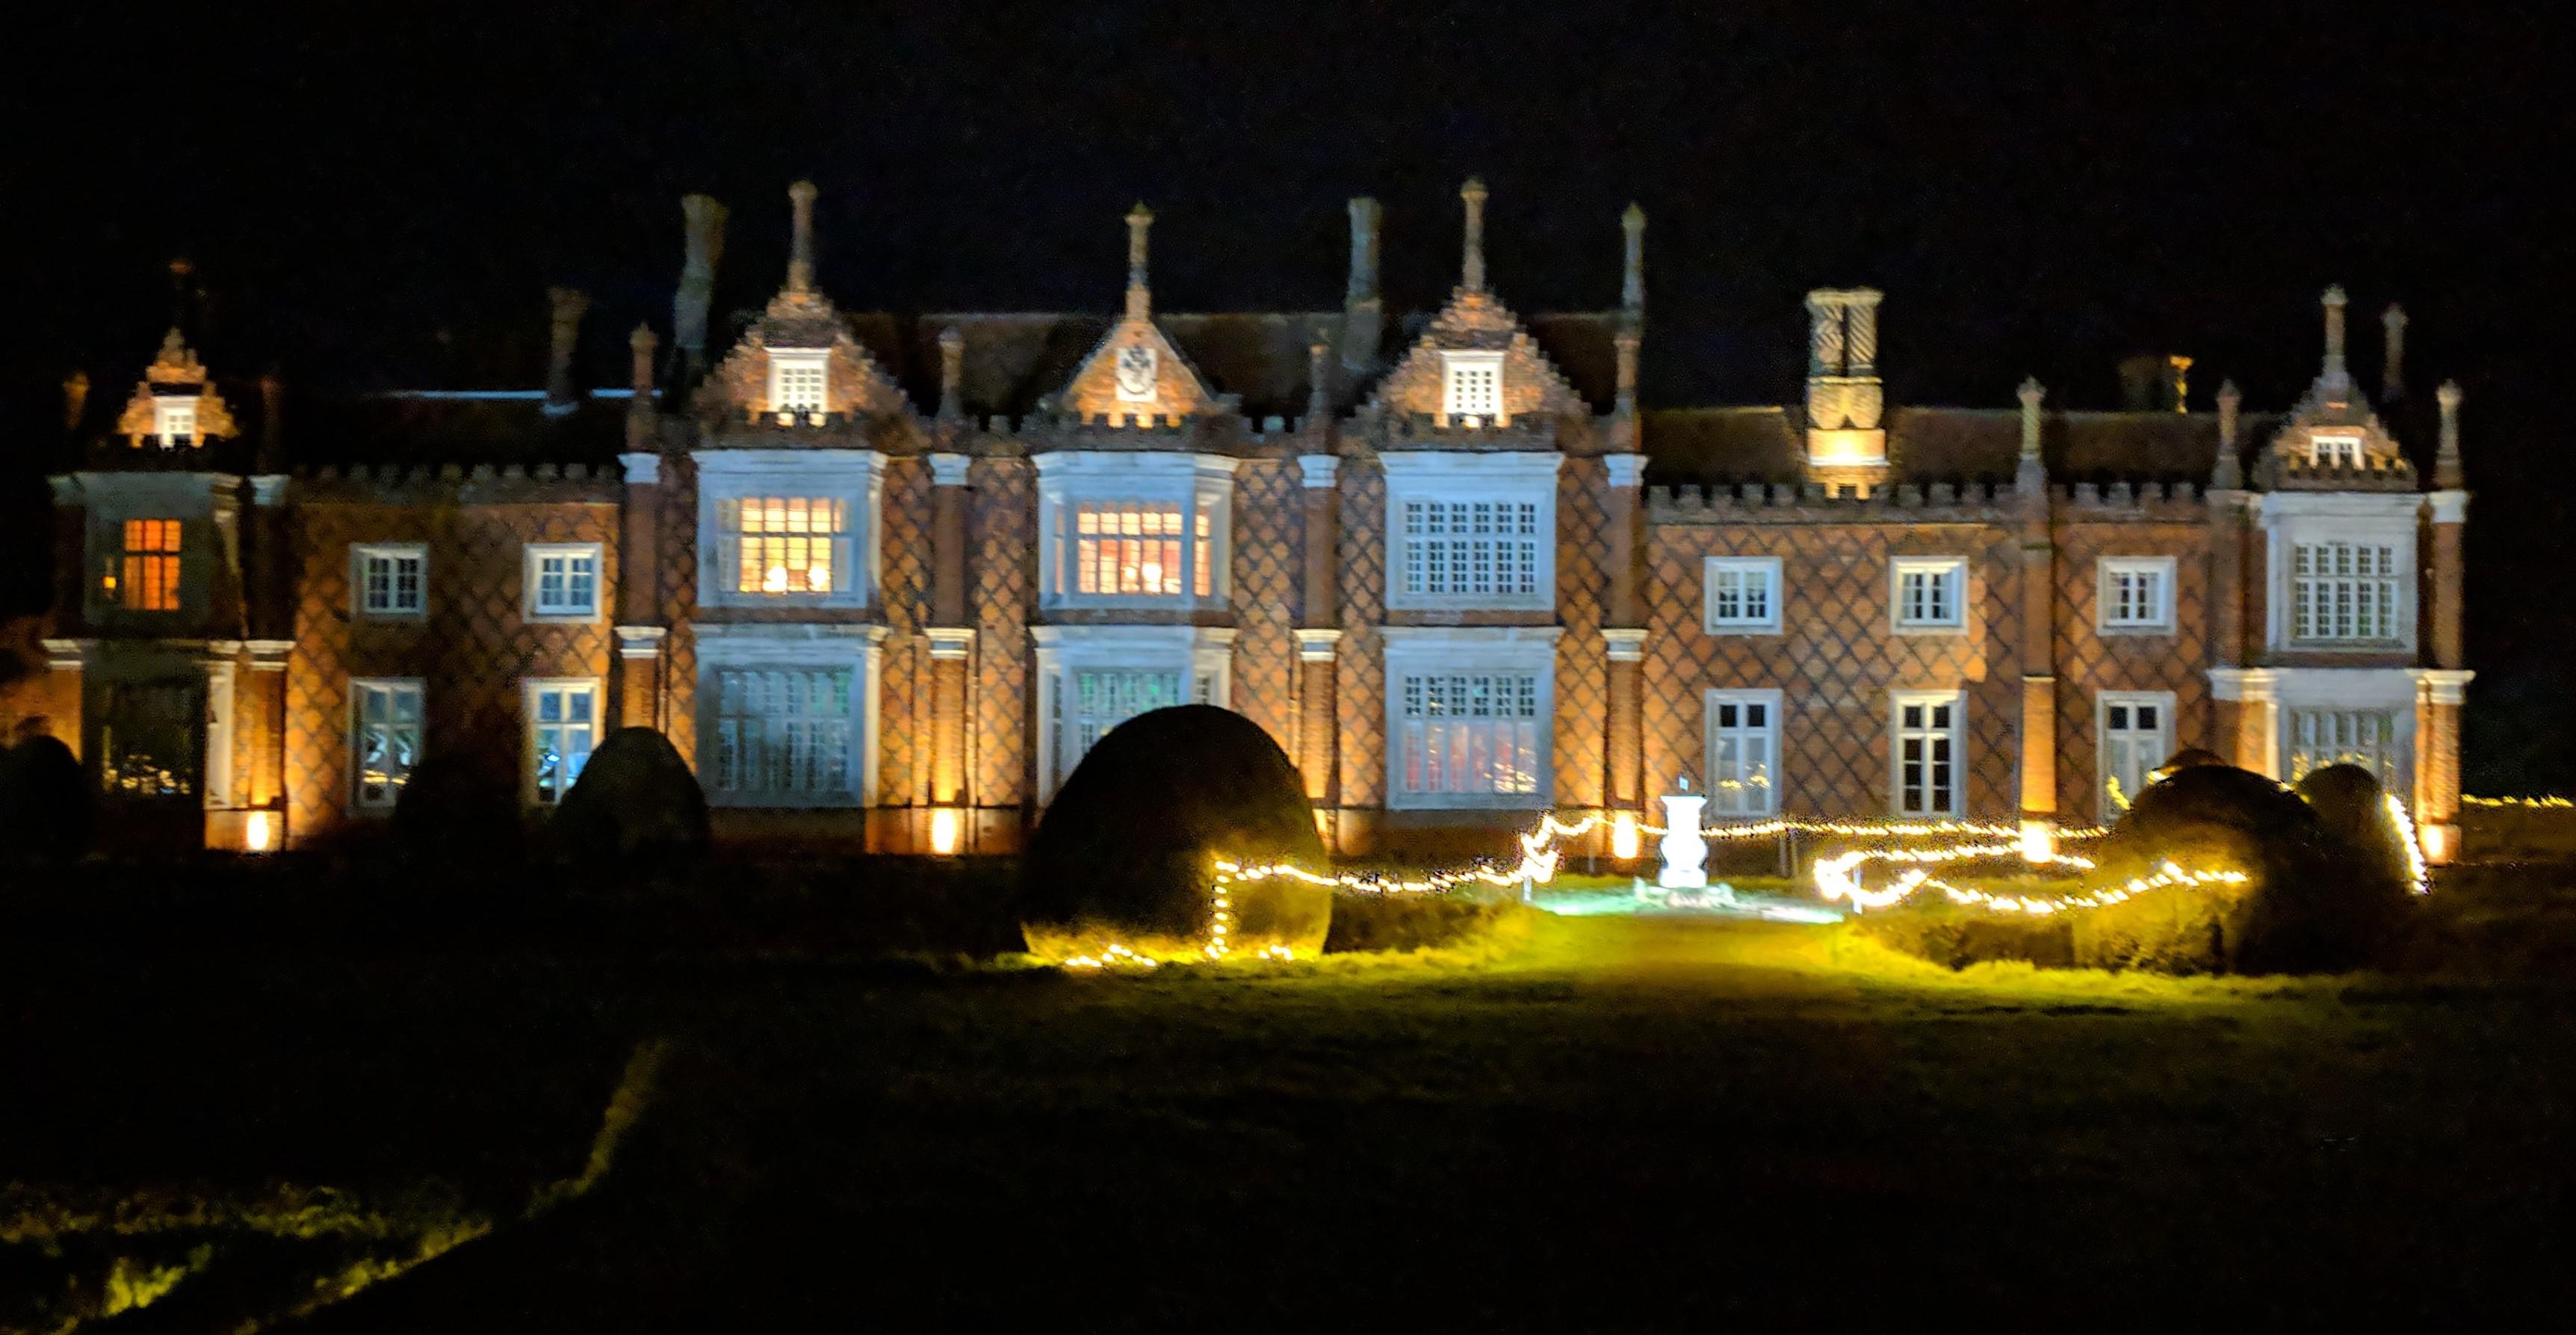 Illuminated Lights at Helmingham Hall